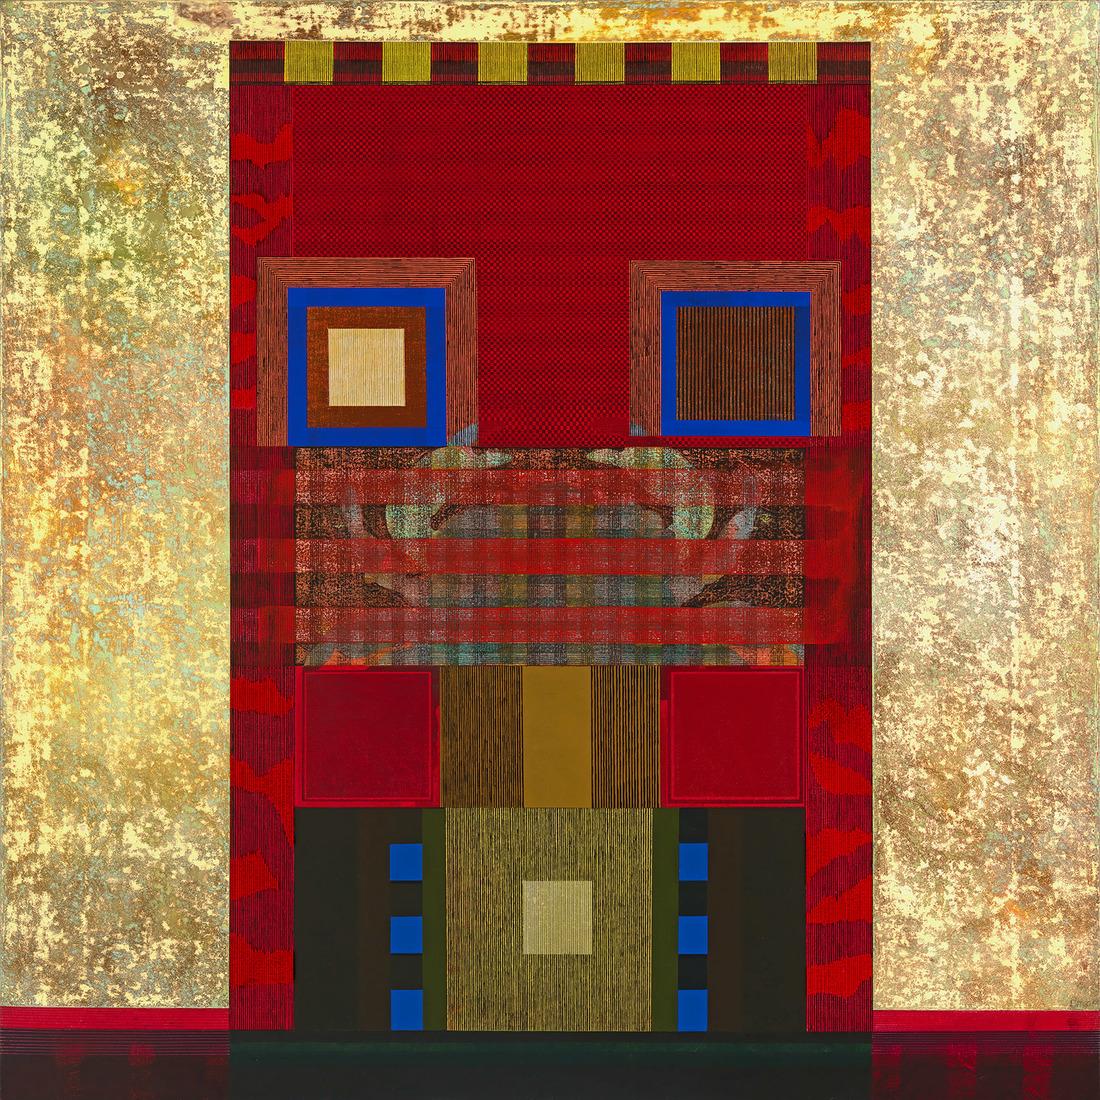 David Keith MILNE (b.1946) - THE BRIGHT RED HOUSE